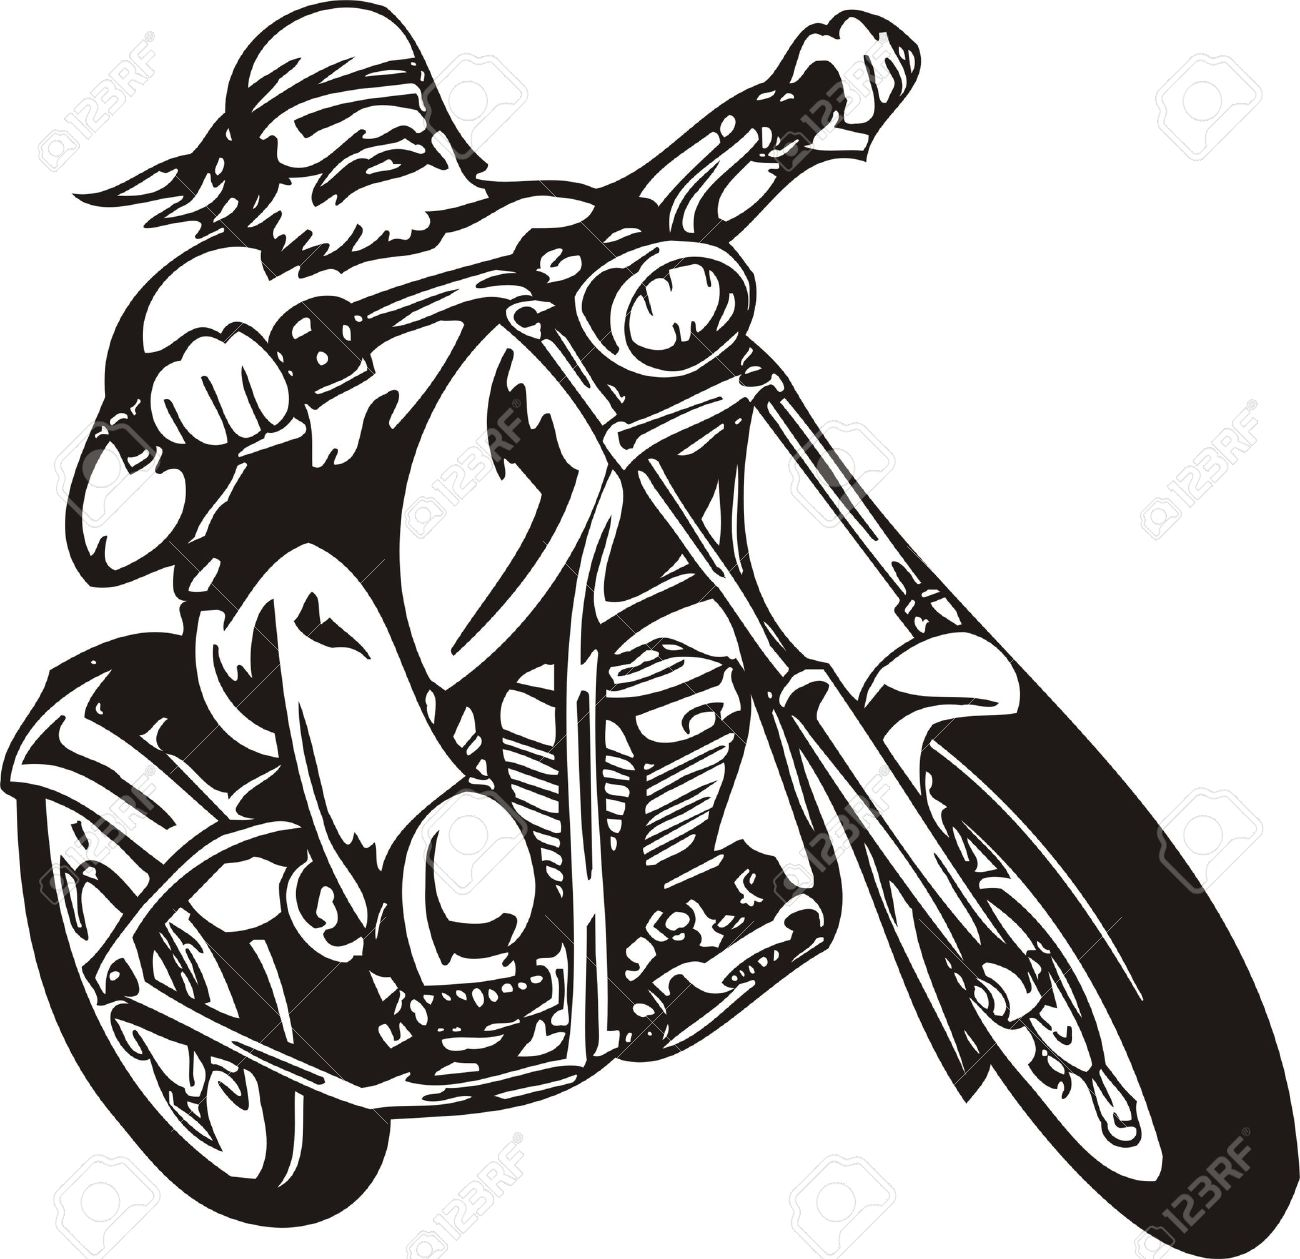 Biker on Motorcycle. Vector Illustration. Stock Vector - 8777311